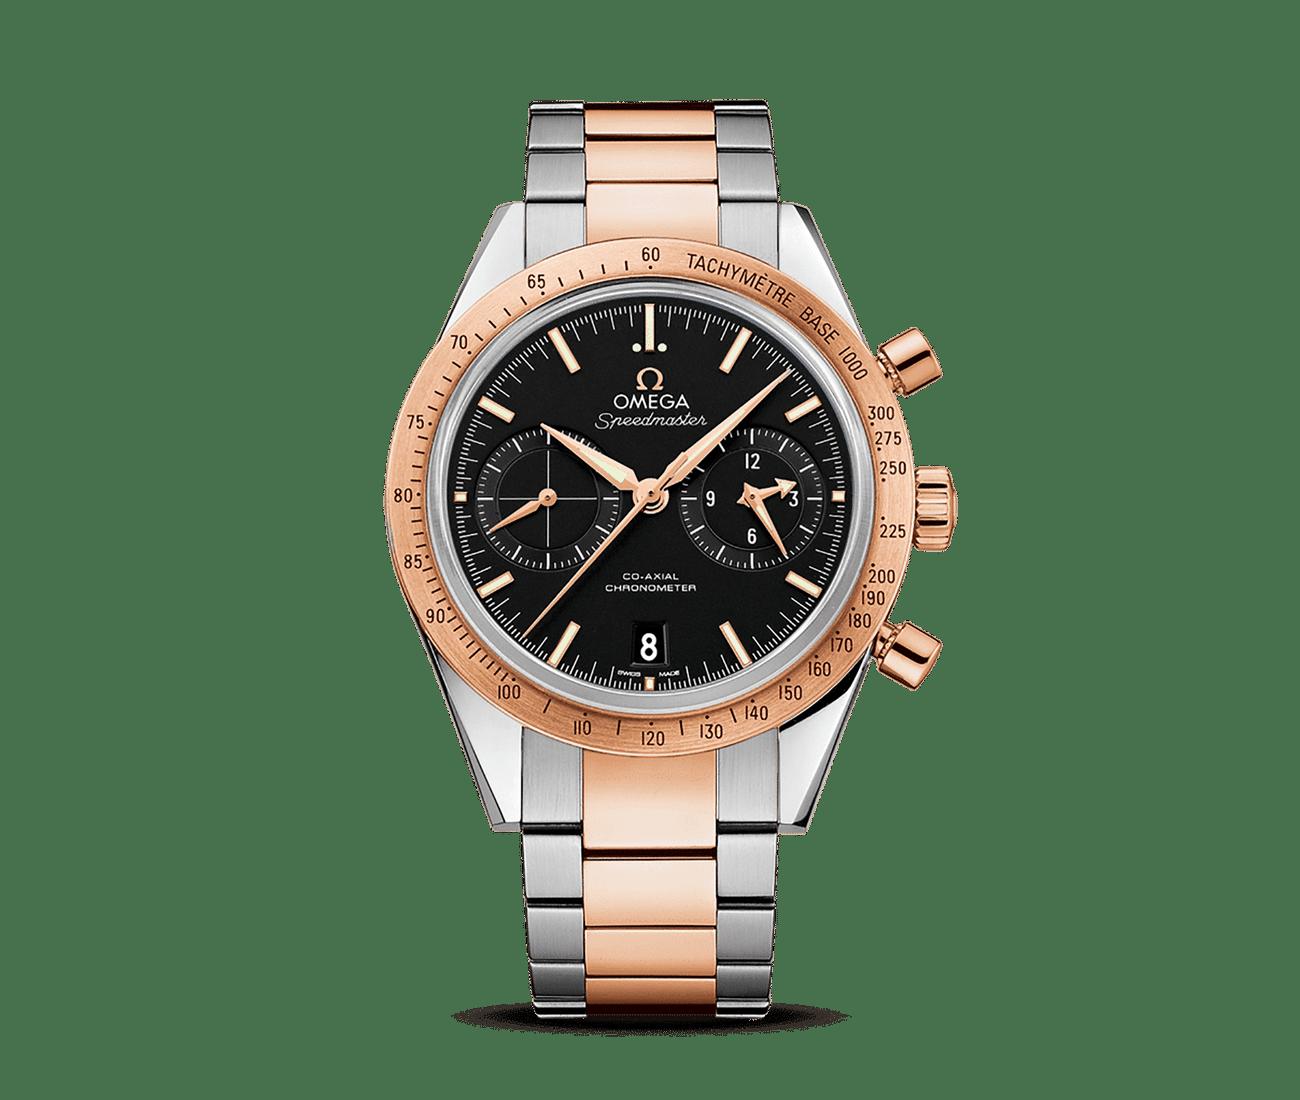 Speedmaster '57 Omega Co-axial Chronograph